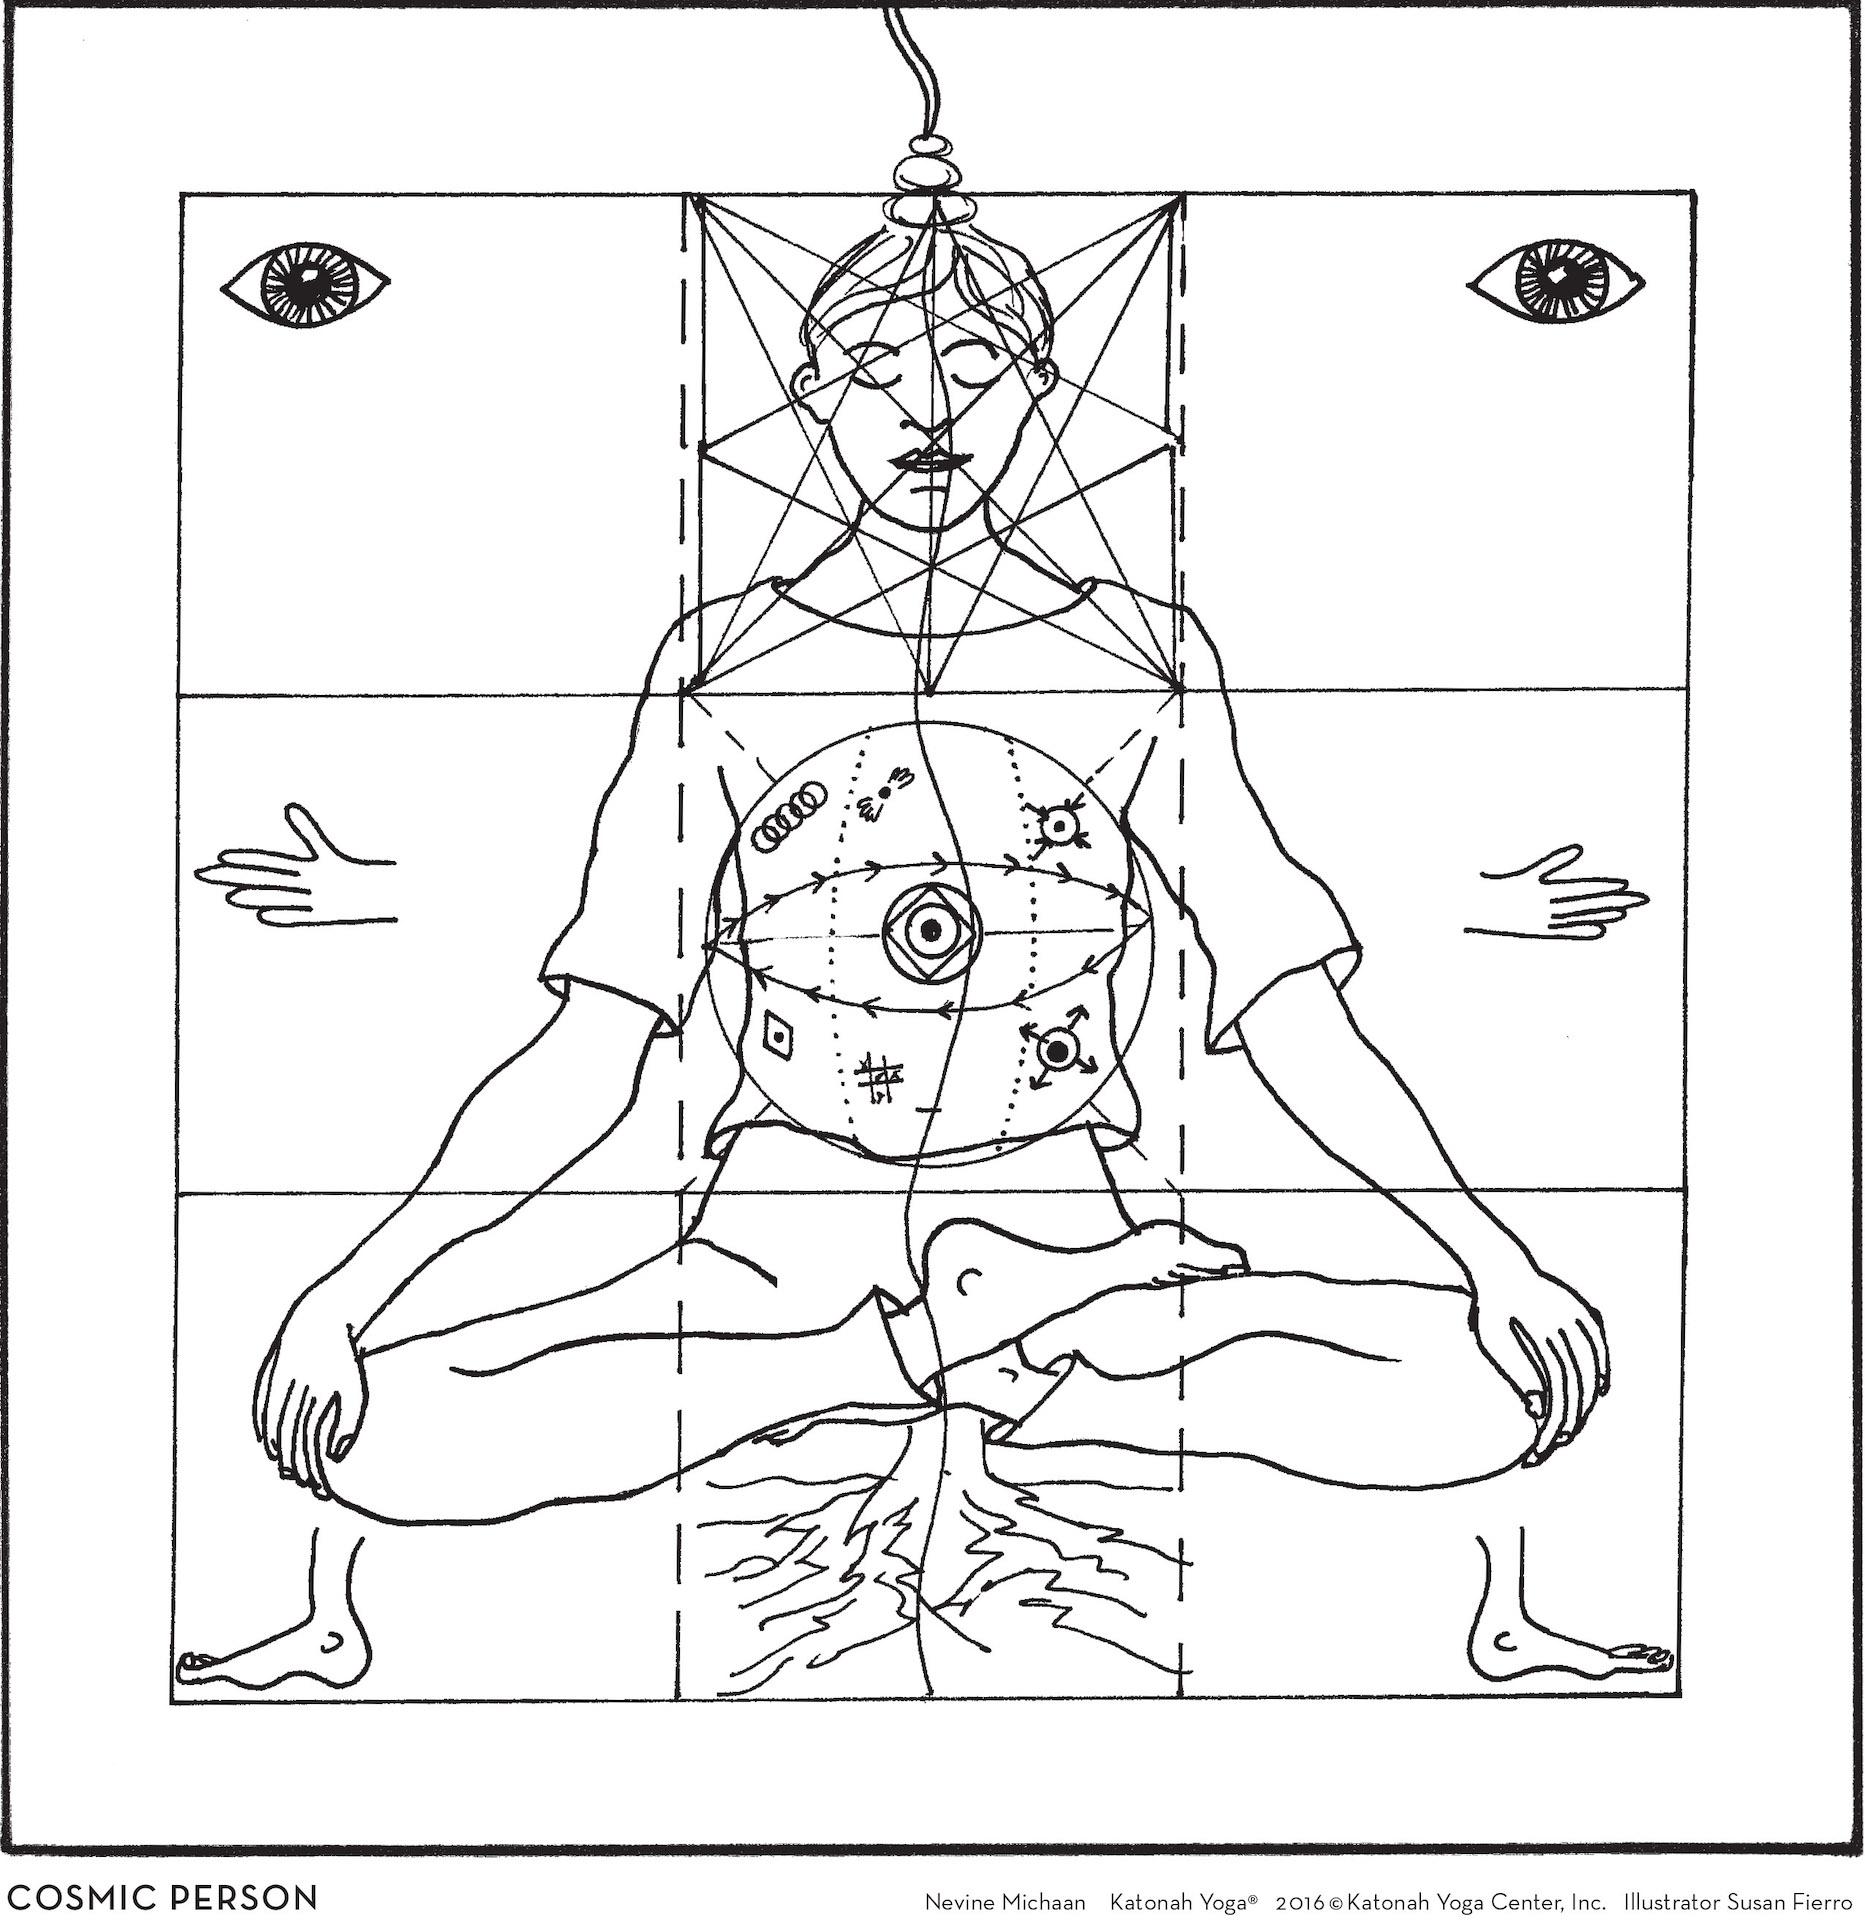 MEDITATION MAPS